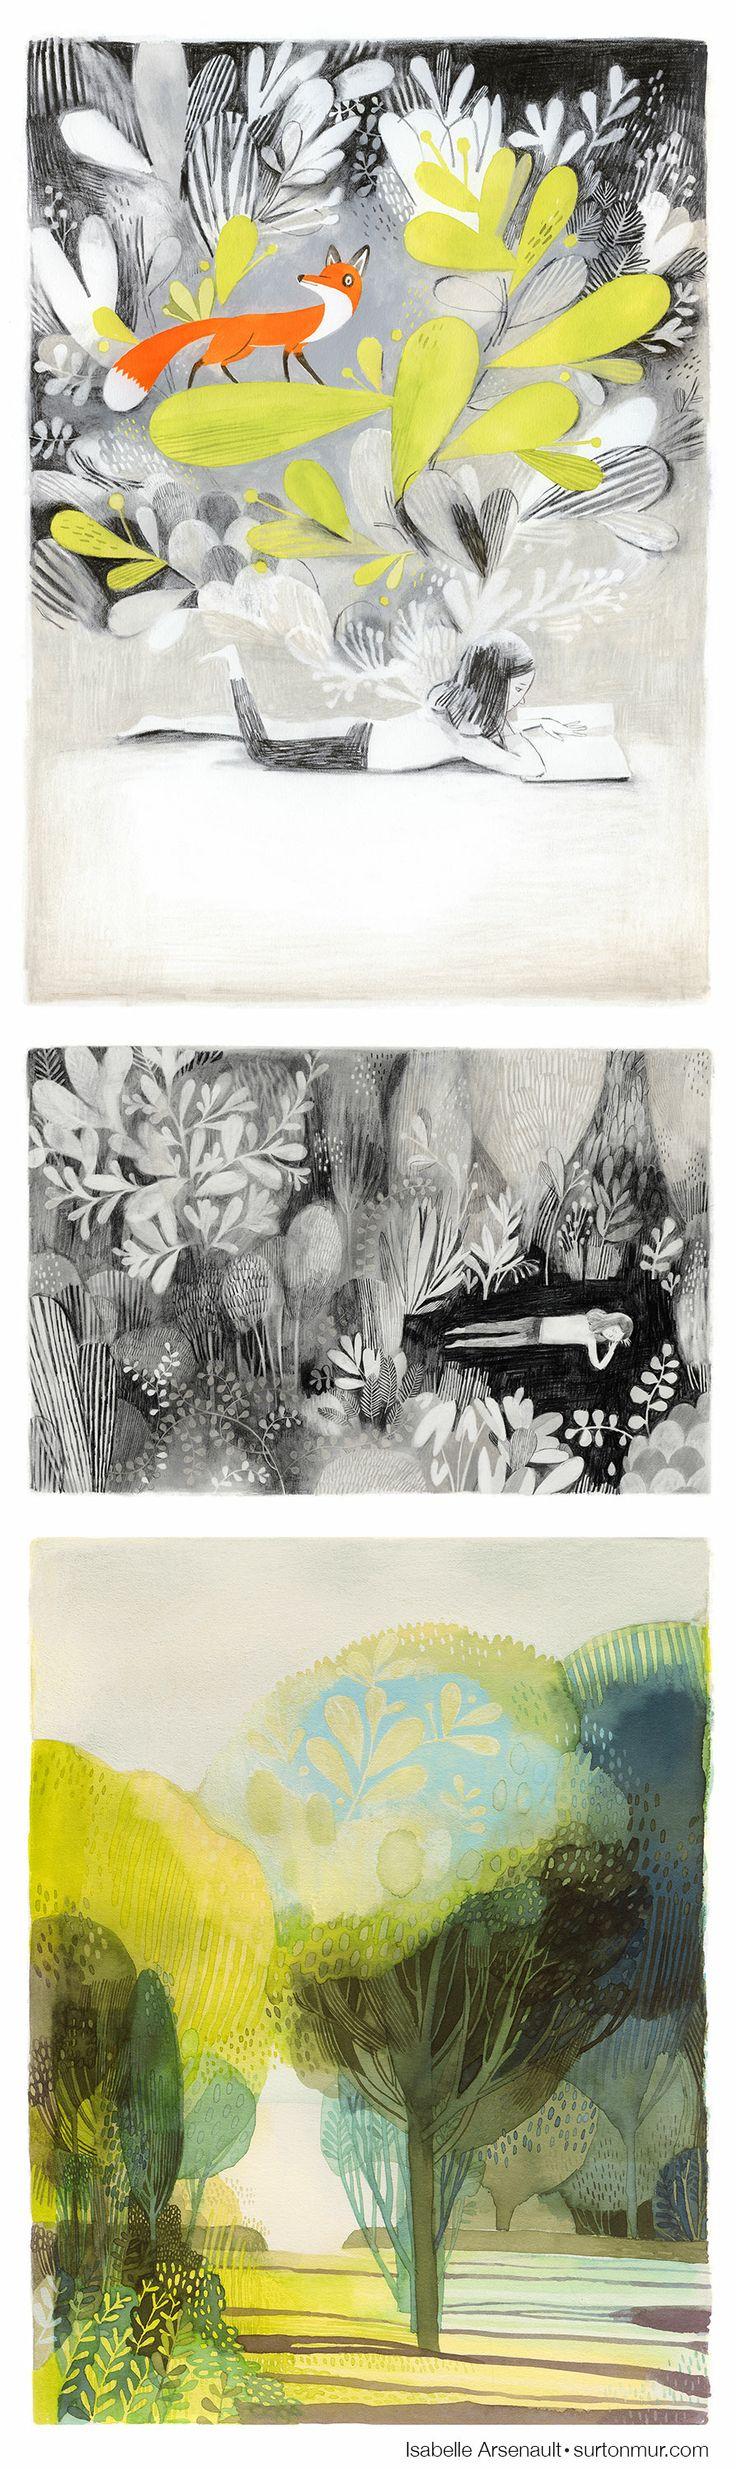 Illustration * Art * Watercolor * Book * Jane, the fox & me * Isabelle Arsenault